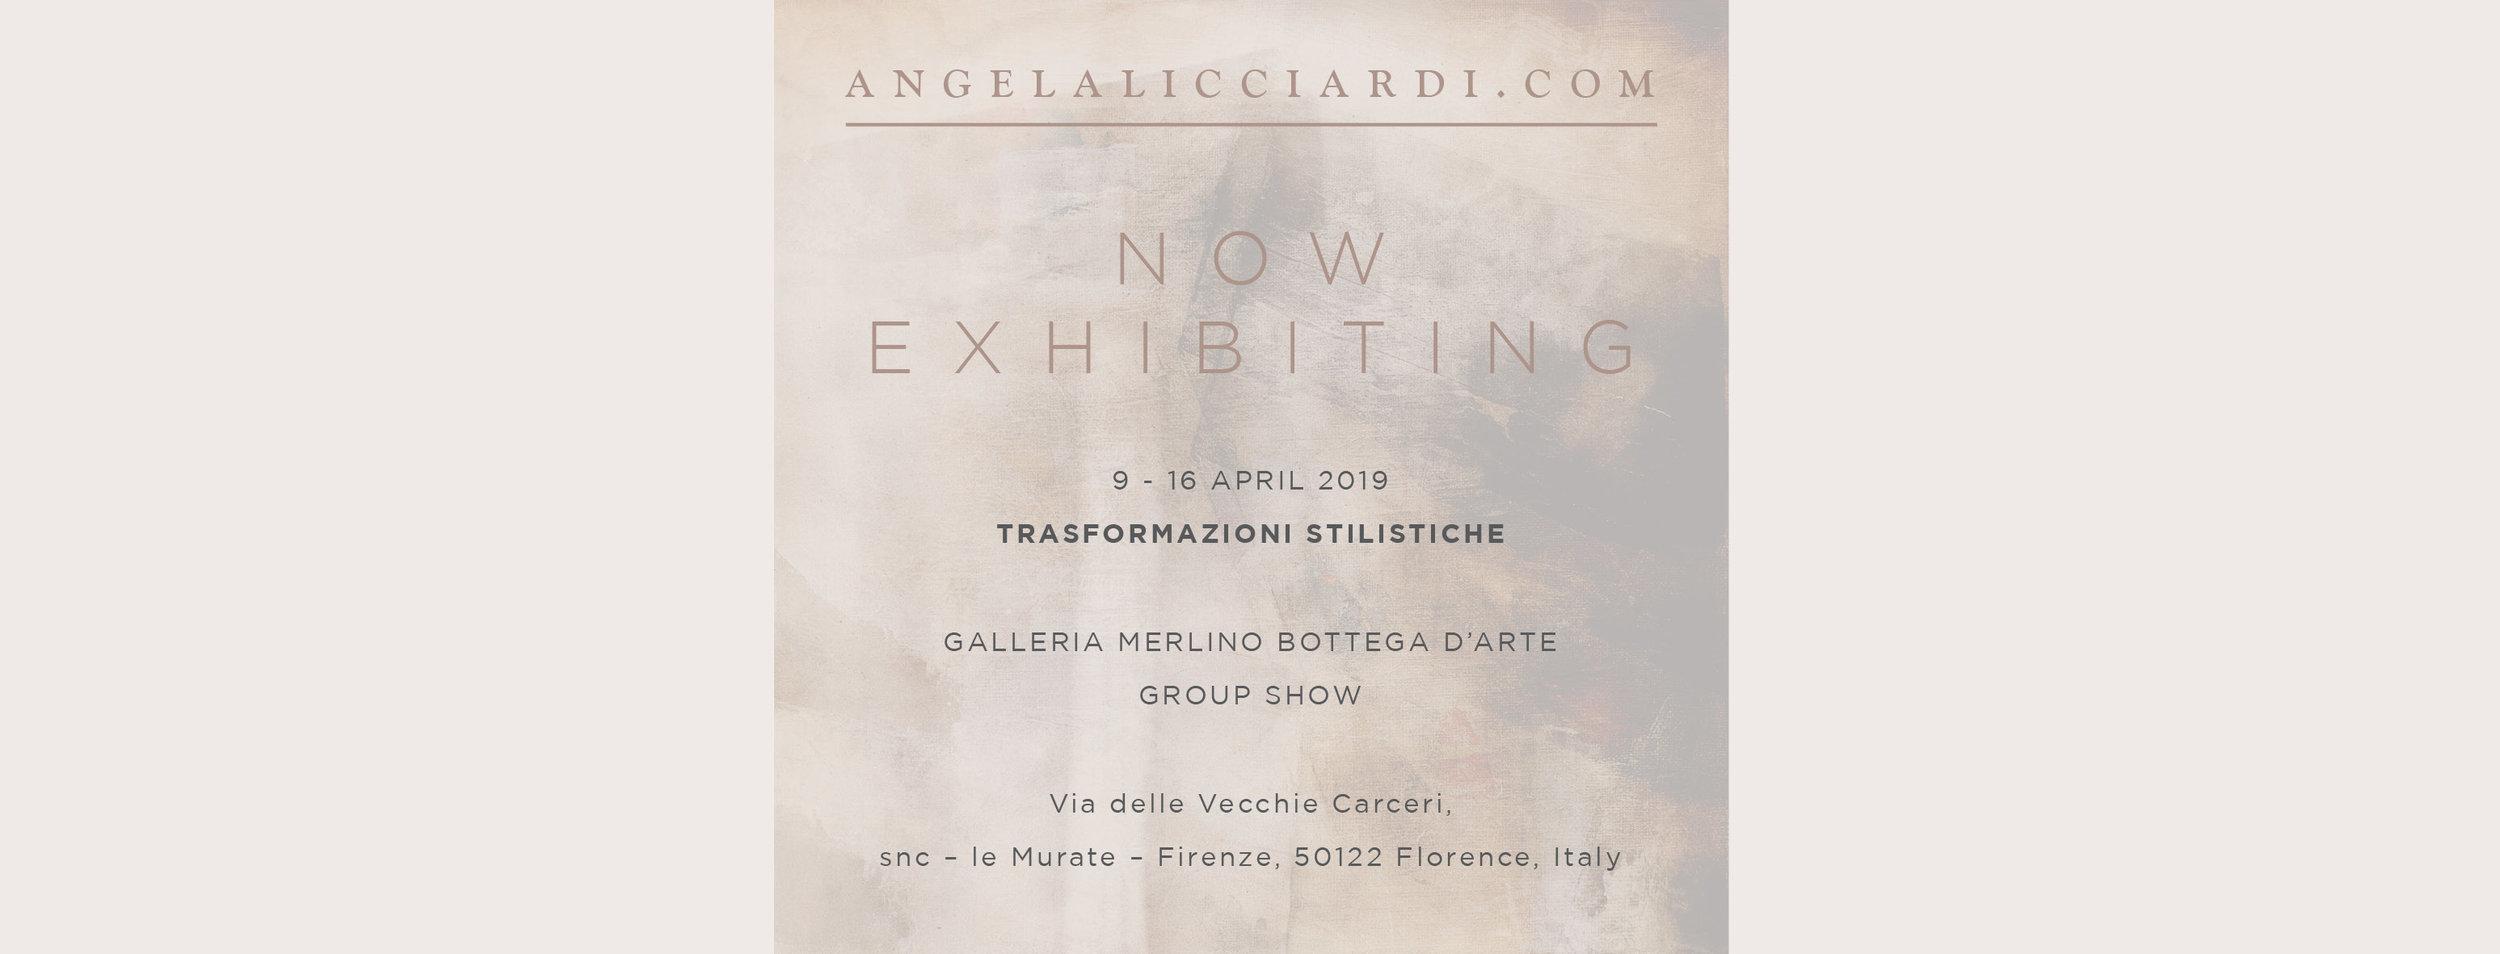 AngelaLicciardiArt_Florence_April19.jpg